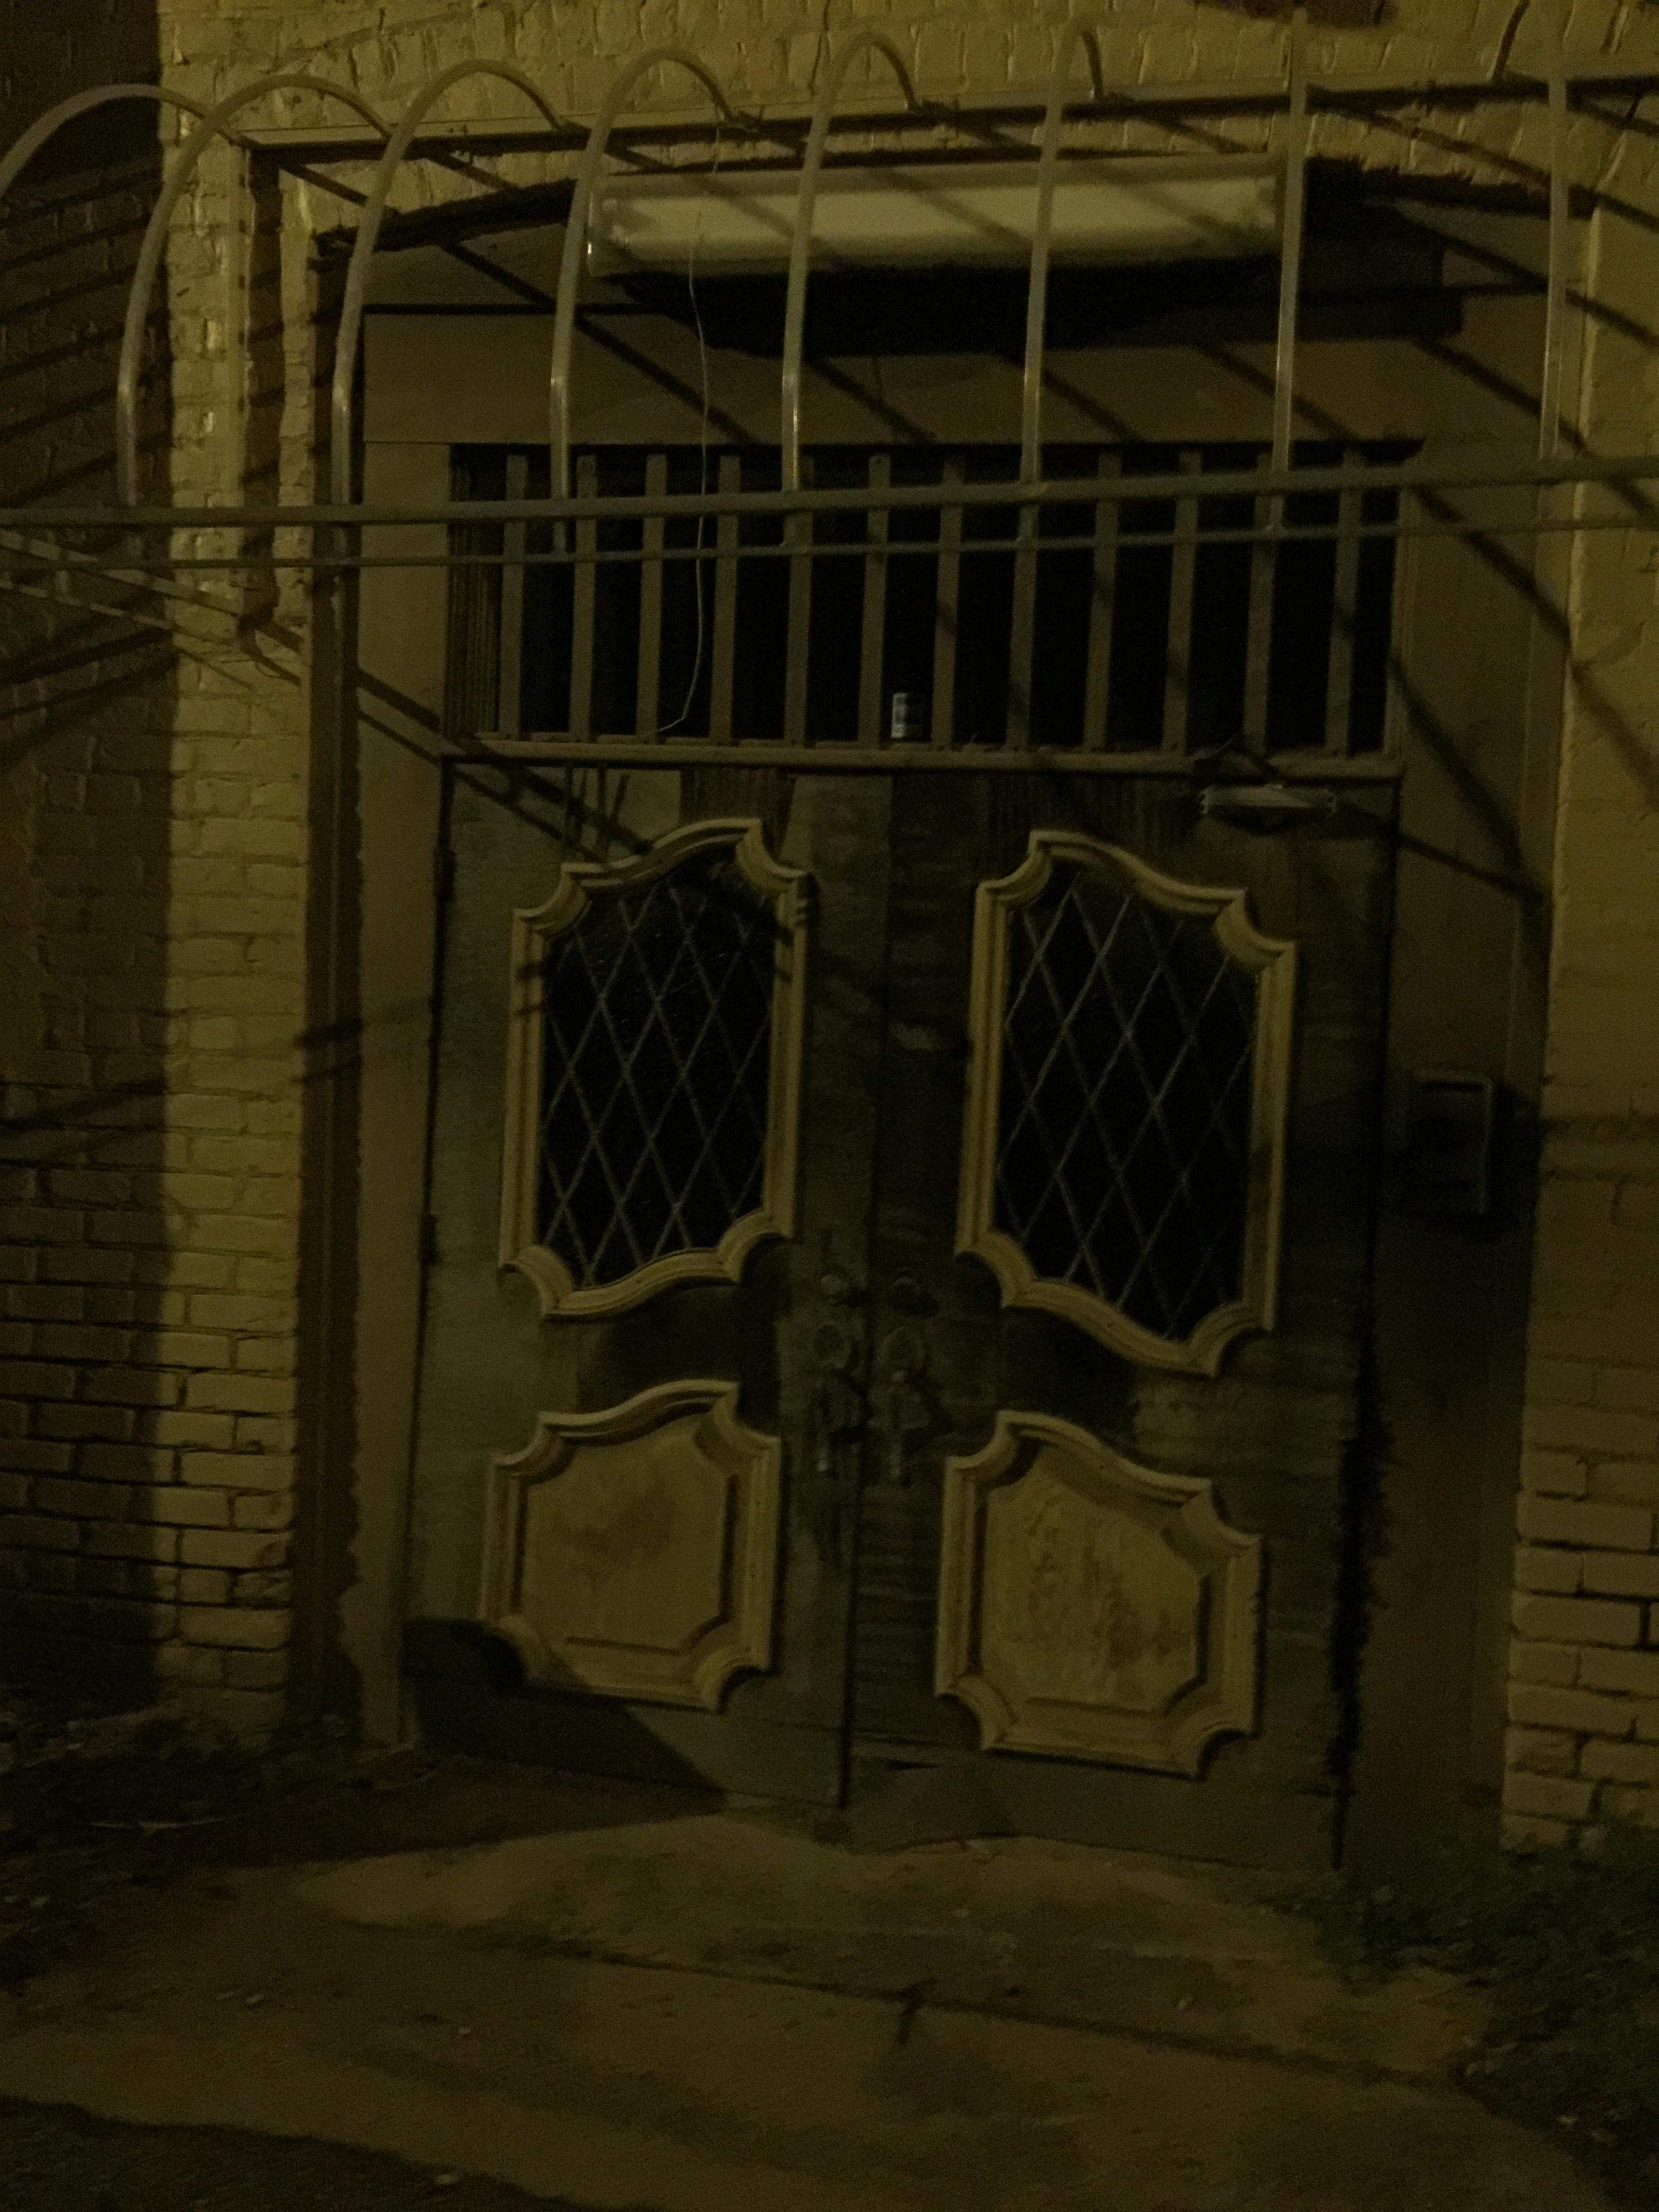 Untitled , Doorways series, 2016  Ginger Cochran